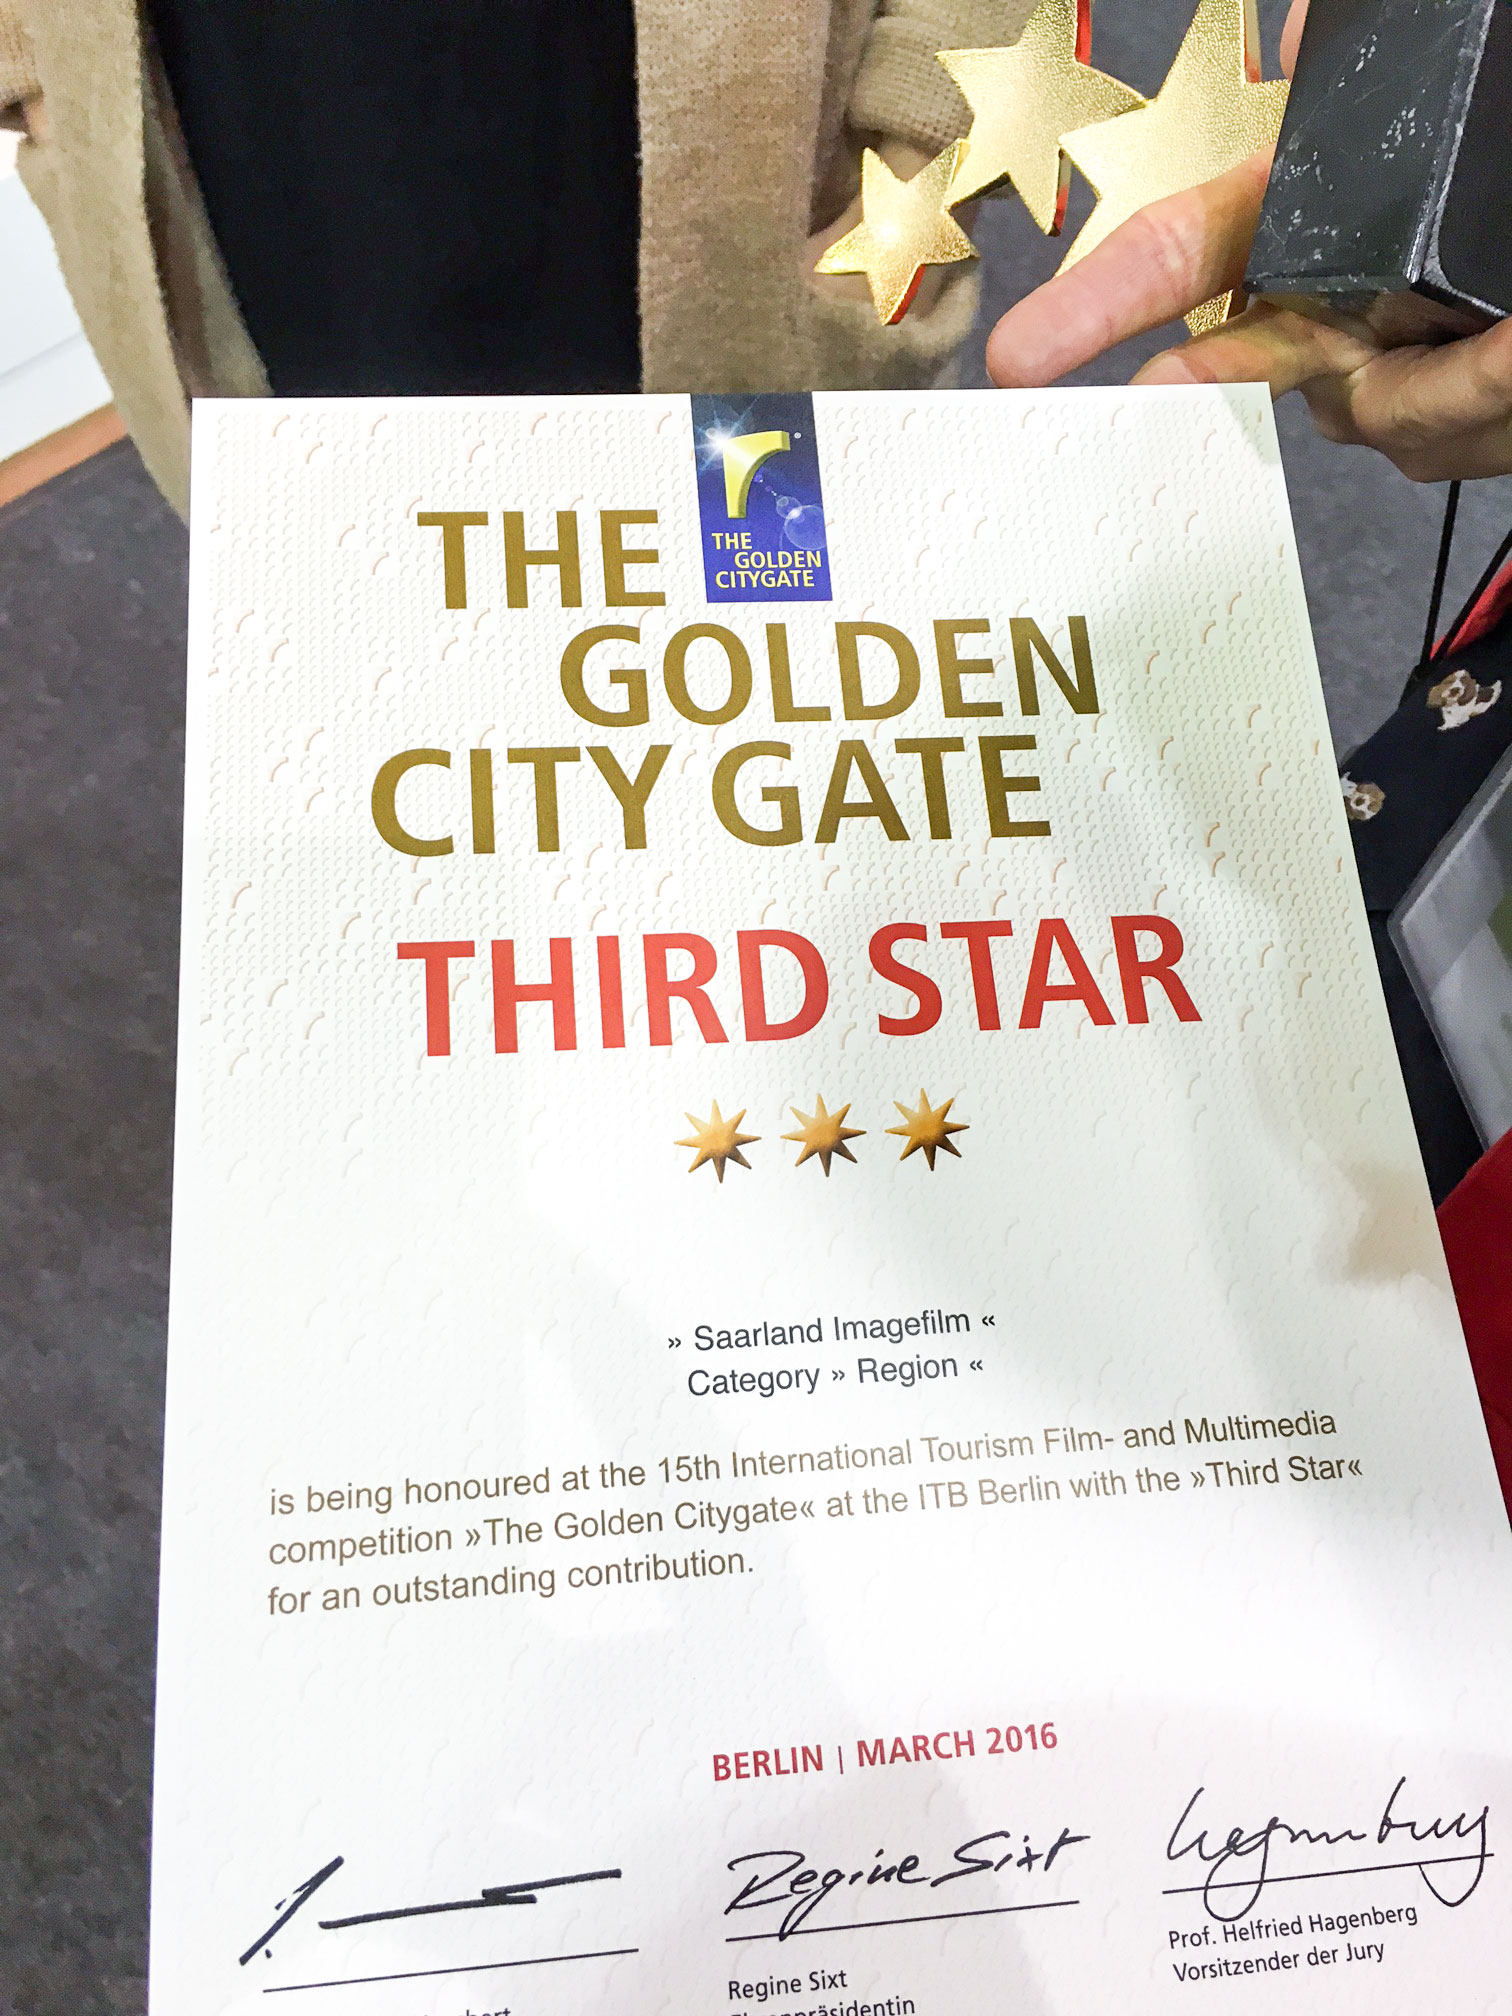 GoldenGateGewinn_gethungry_002_2016.jpg